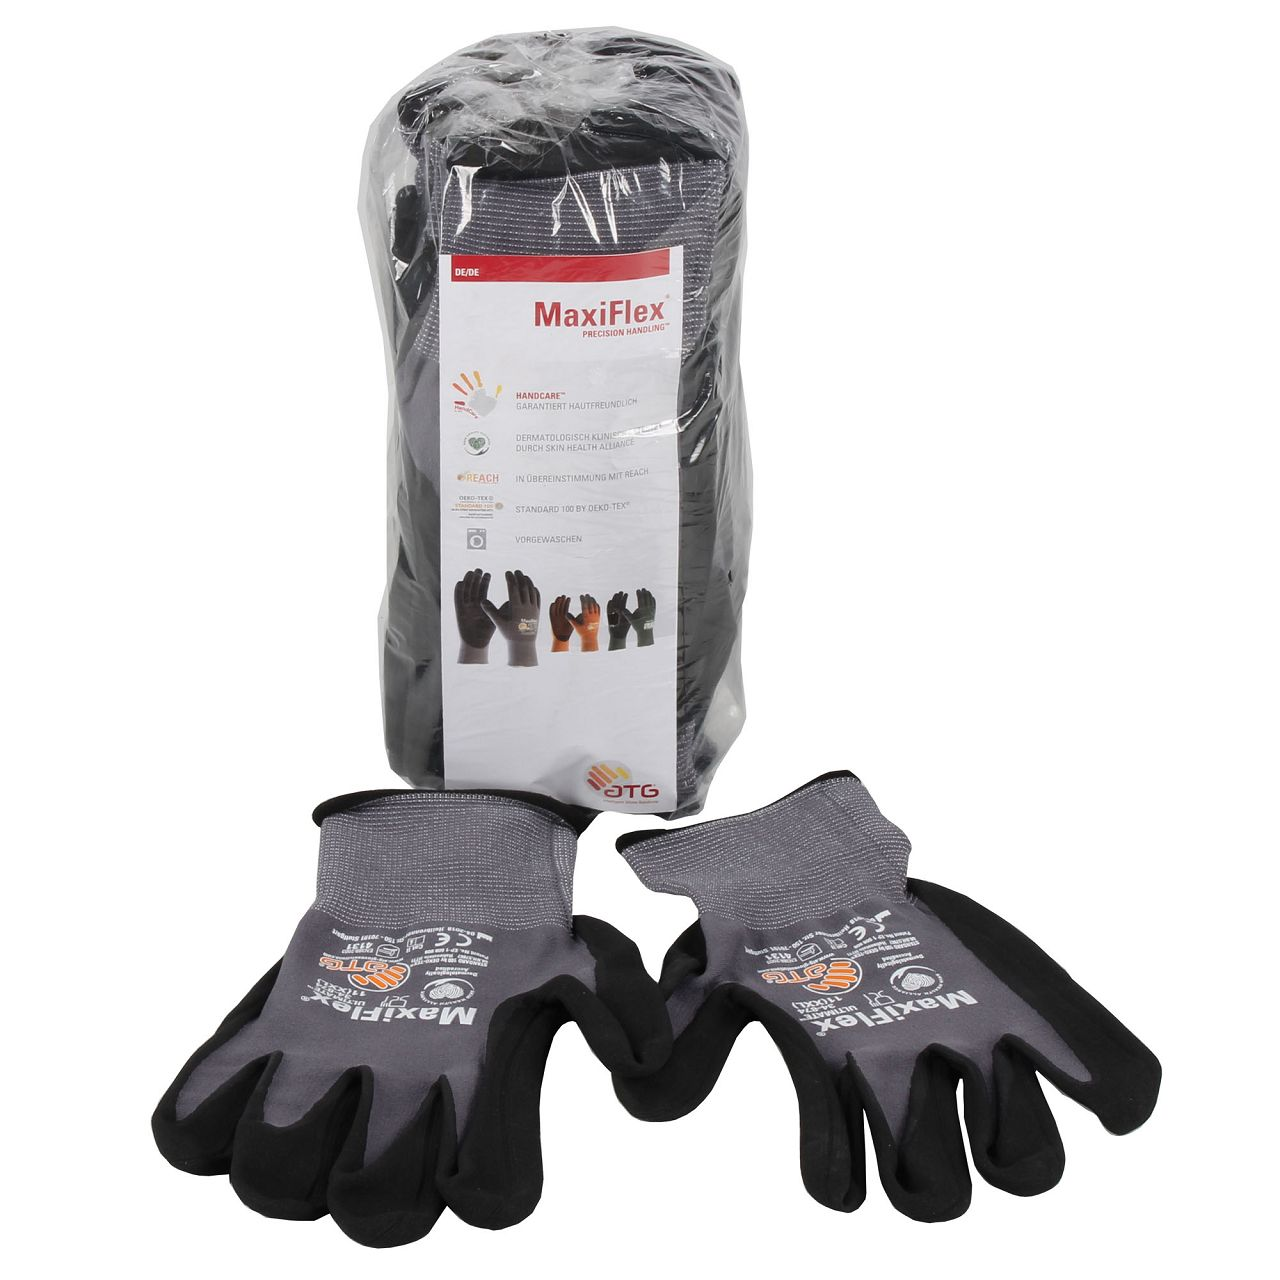 MAXIFLEX Ultimate ATG Texxor Handschuhe Arbeitshandschuhe Größe 11 / XXL 1 Paar